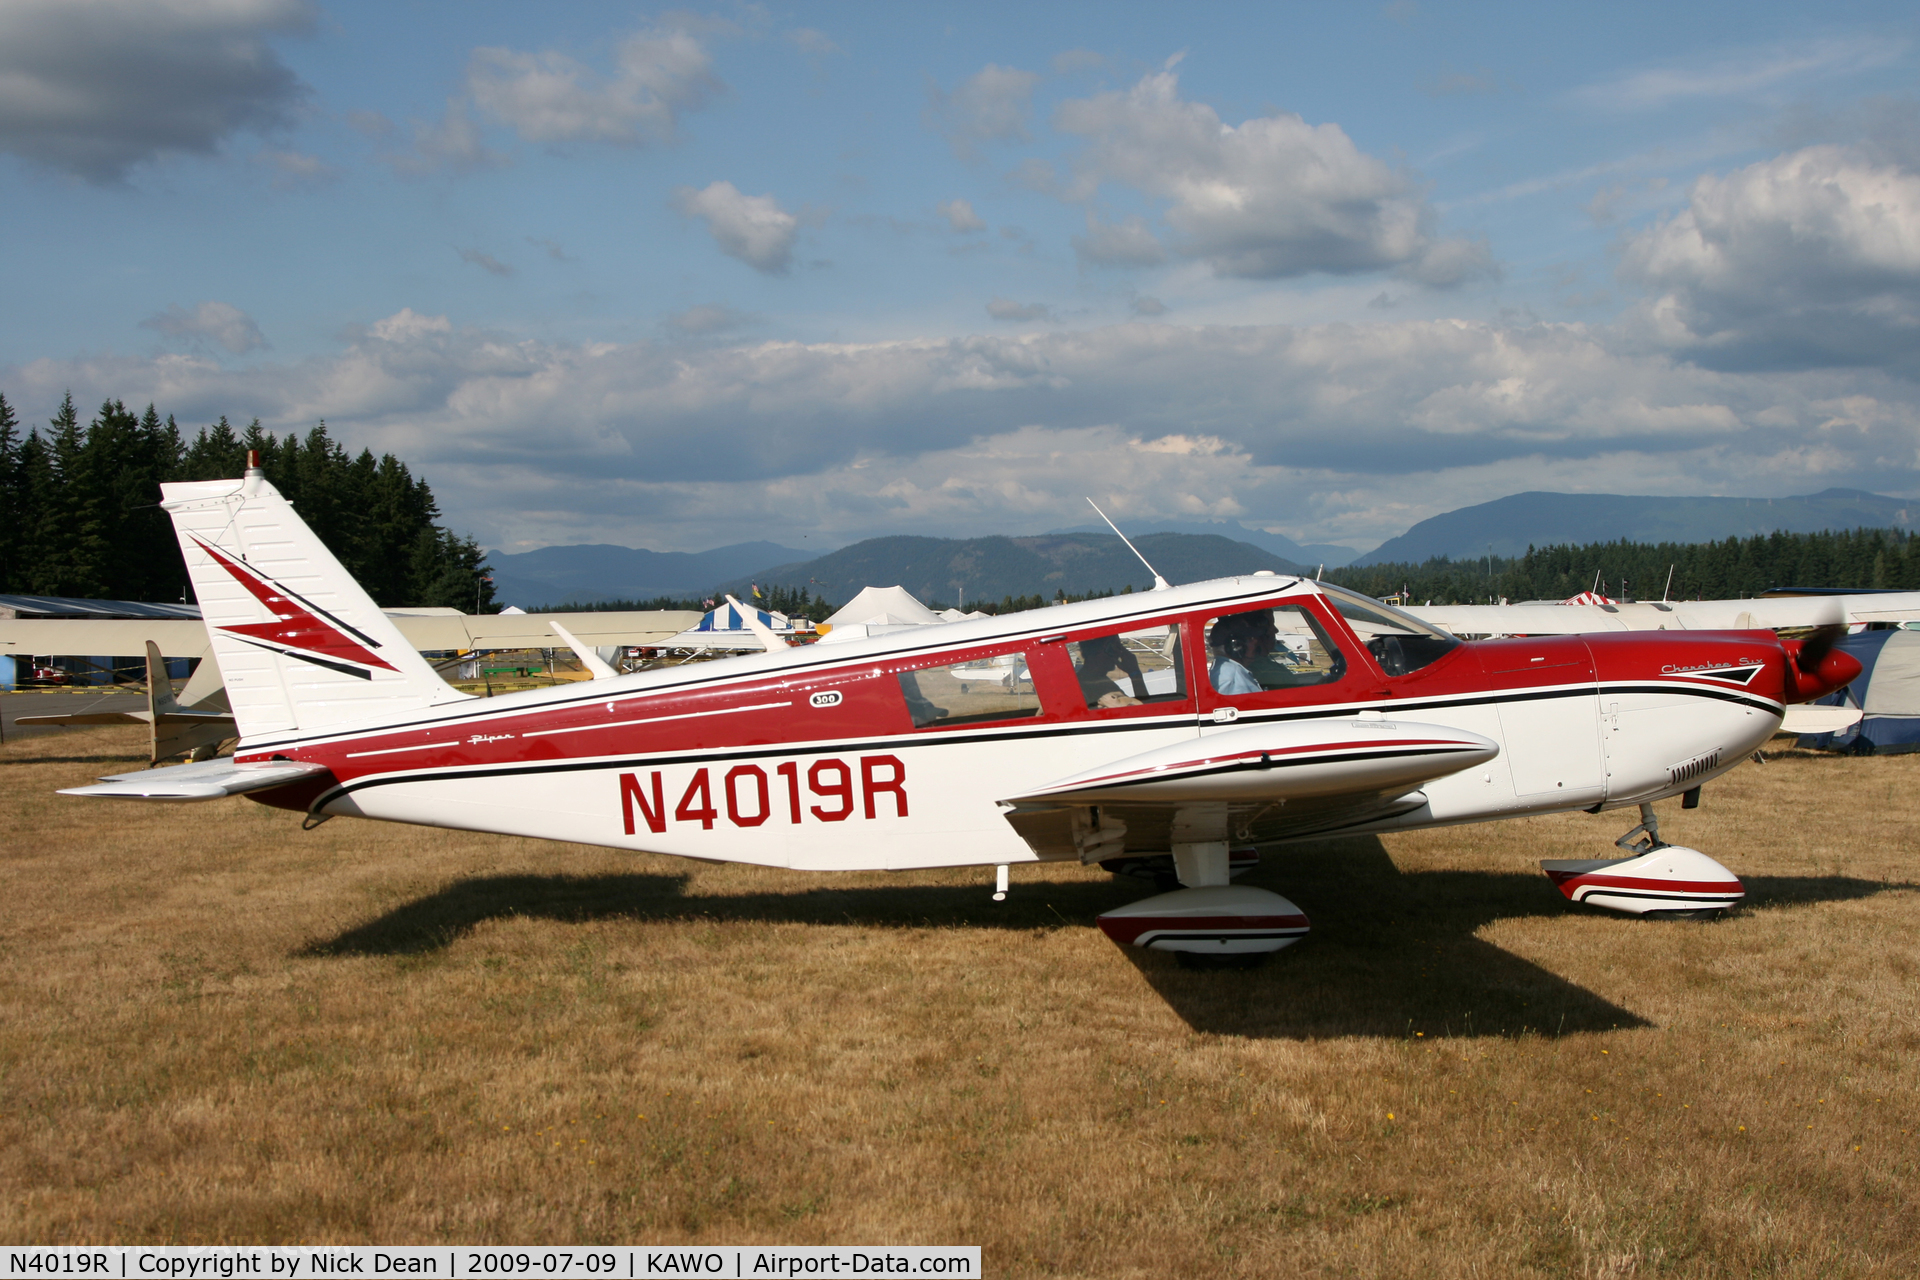 N4019R, 1967 Piper PA-32-300 Cherokee Six C/N 32-40316, KAWO